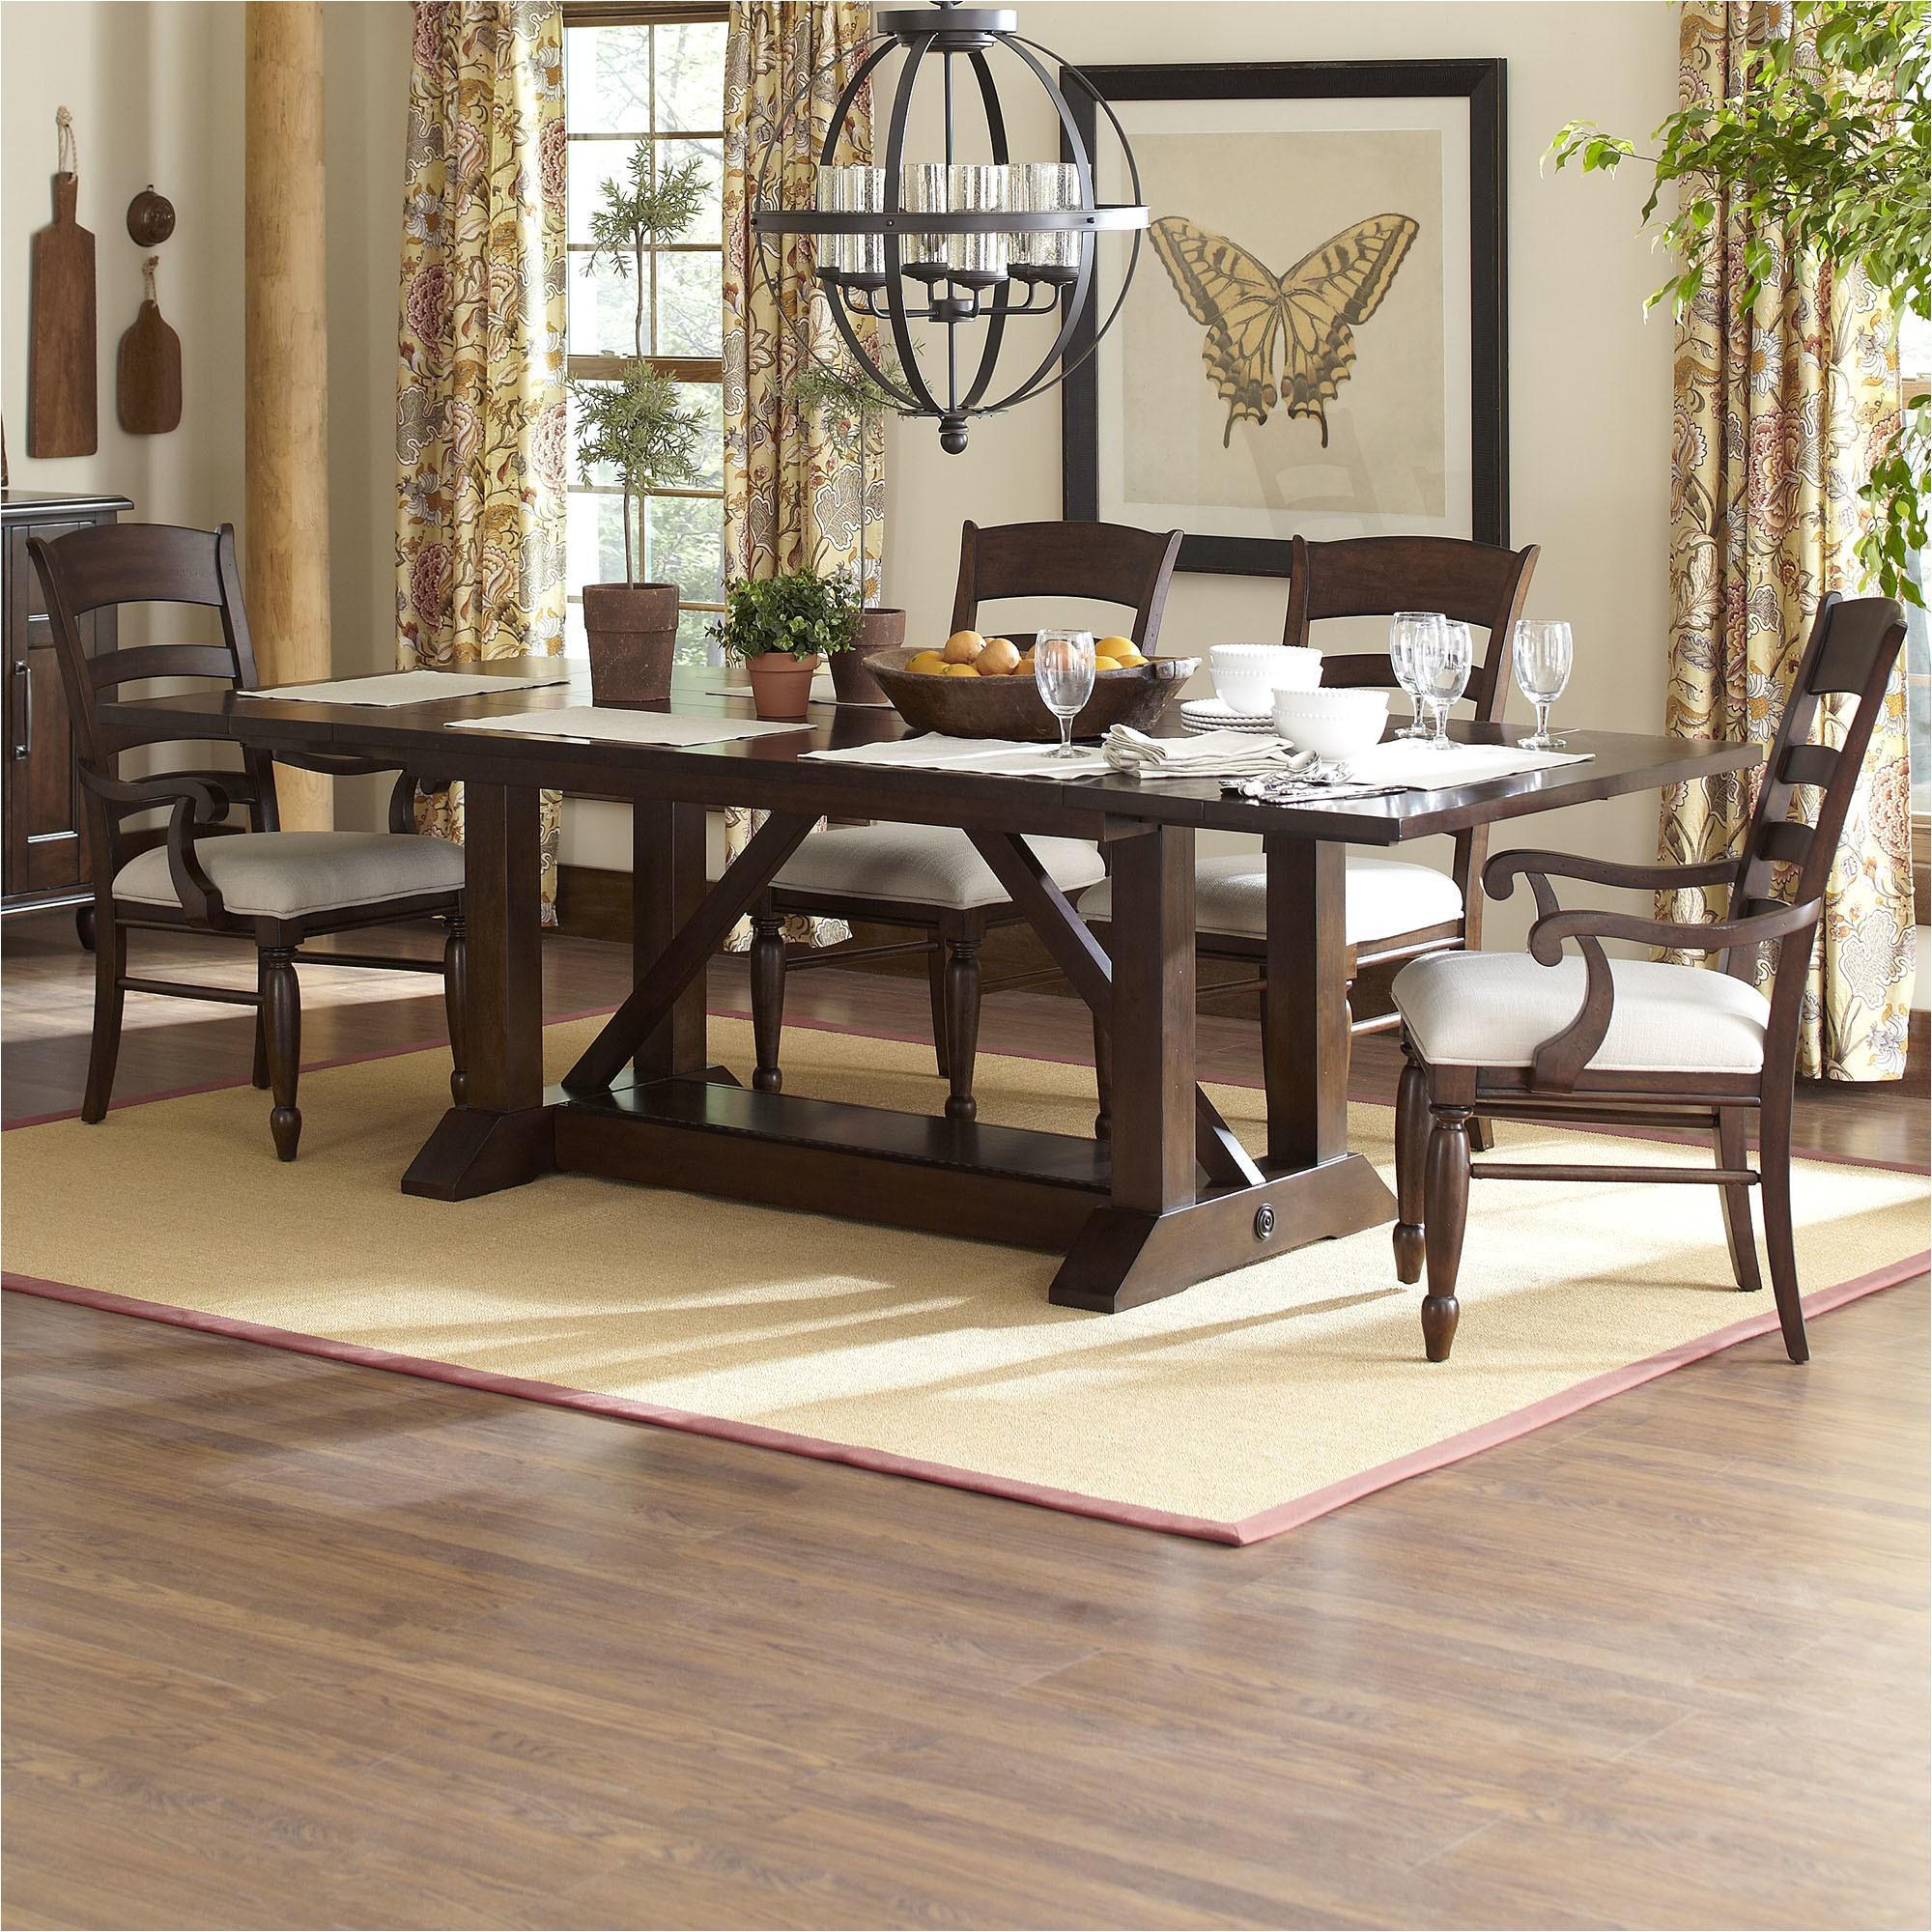 lisbon extending dining table bl4812 bl4812